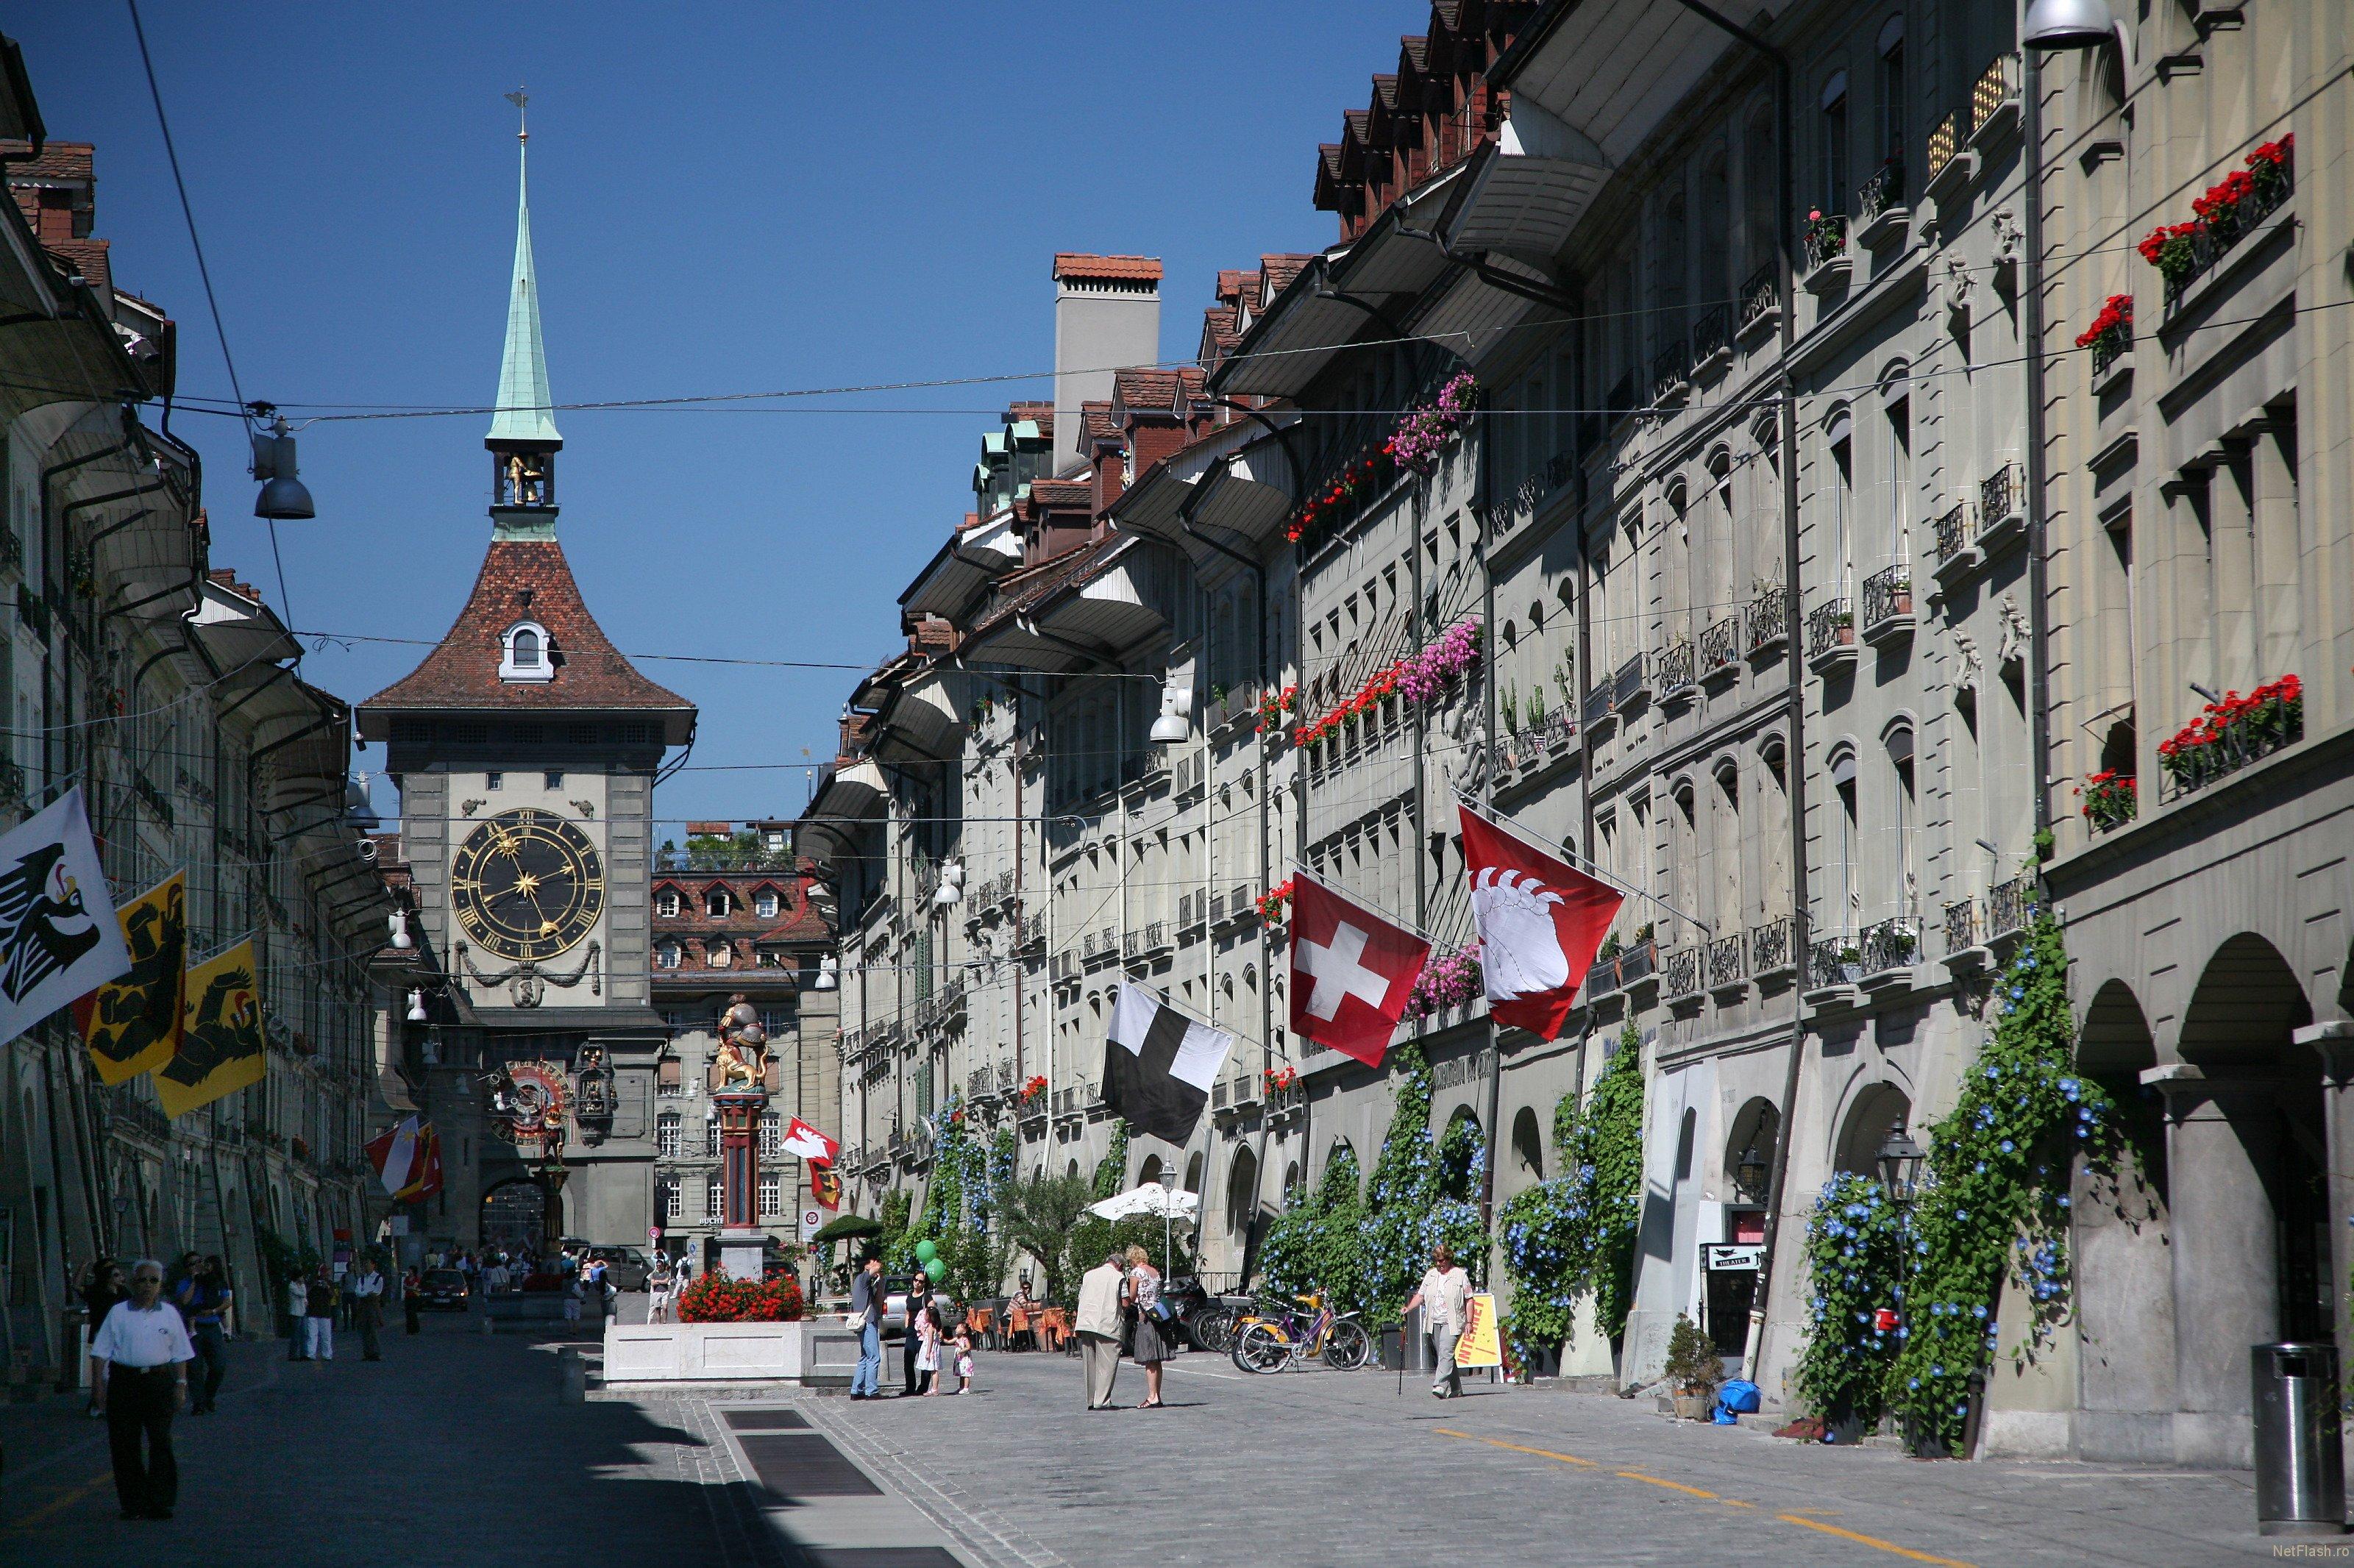 Imagini pentru Elvetia - Berna